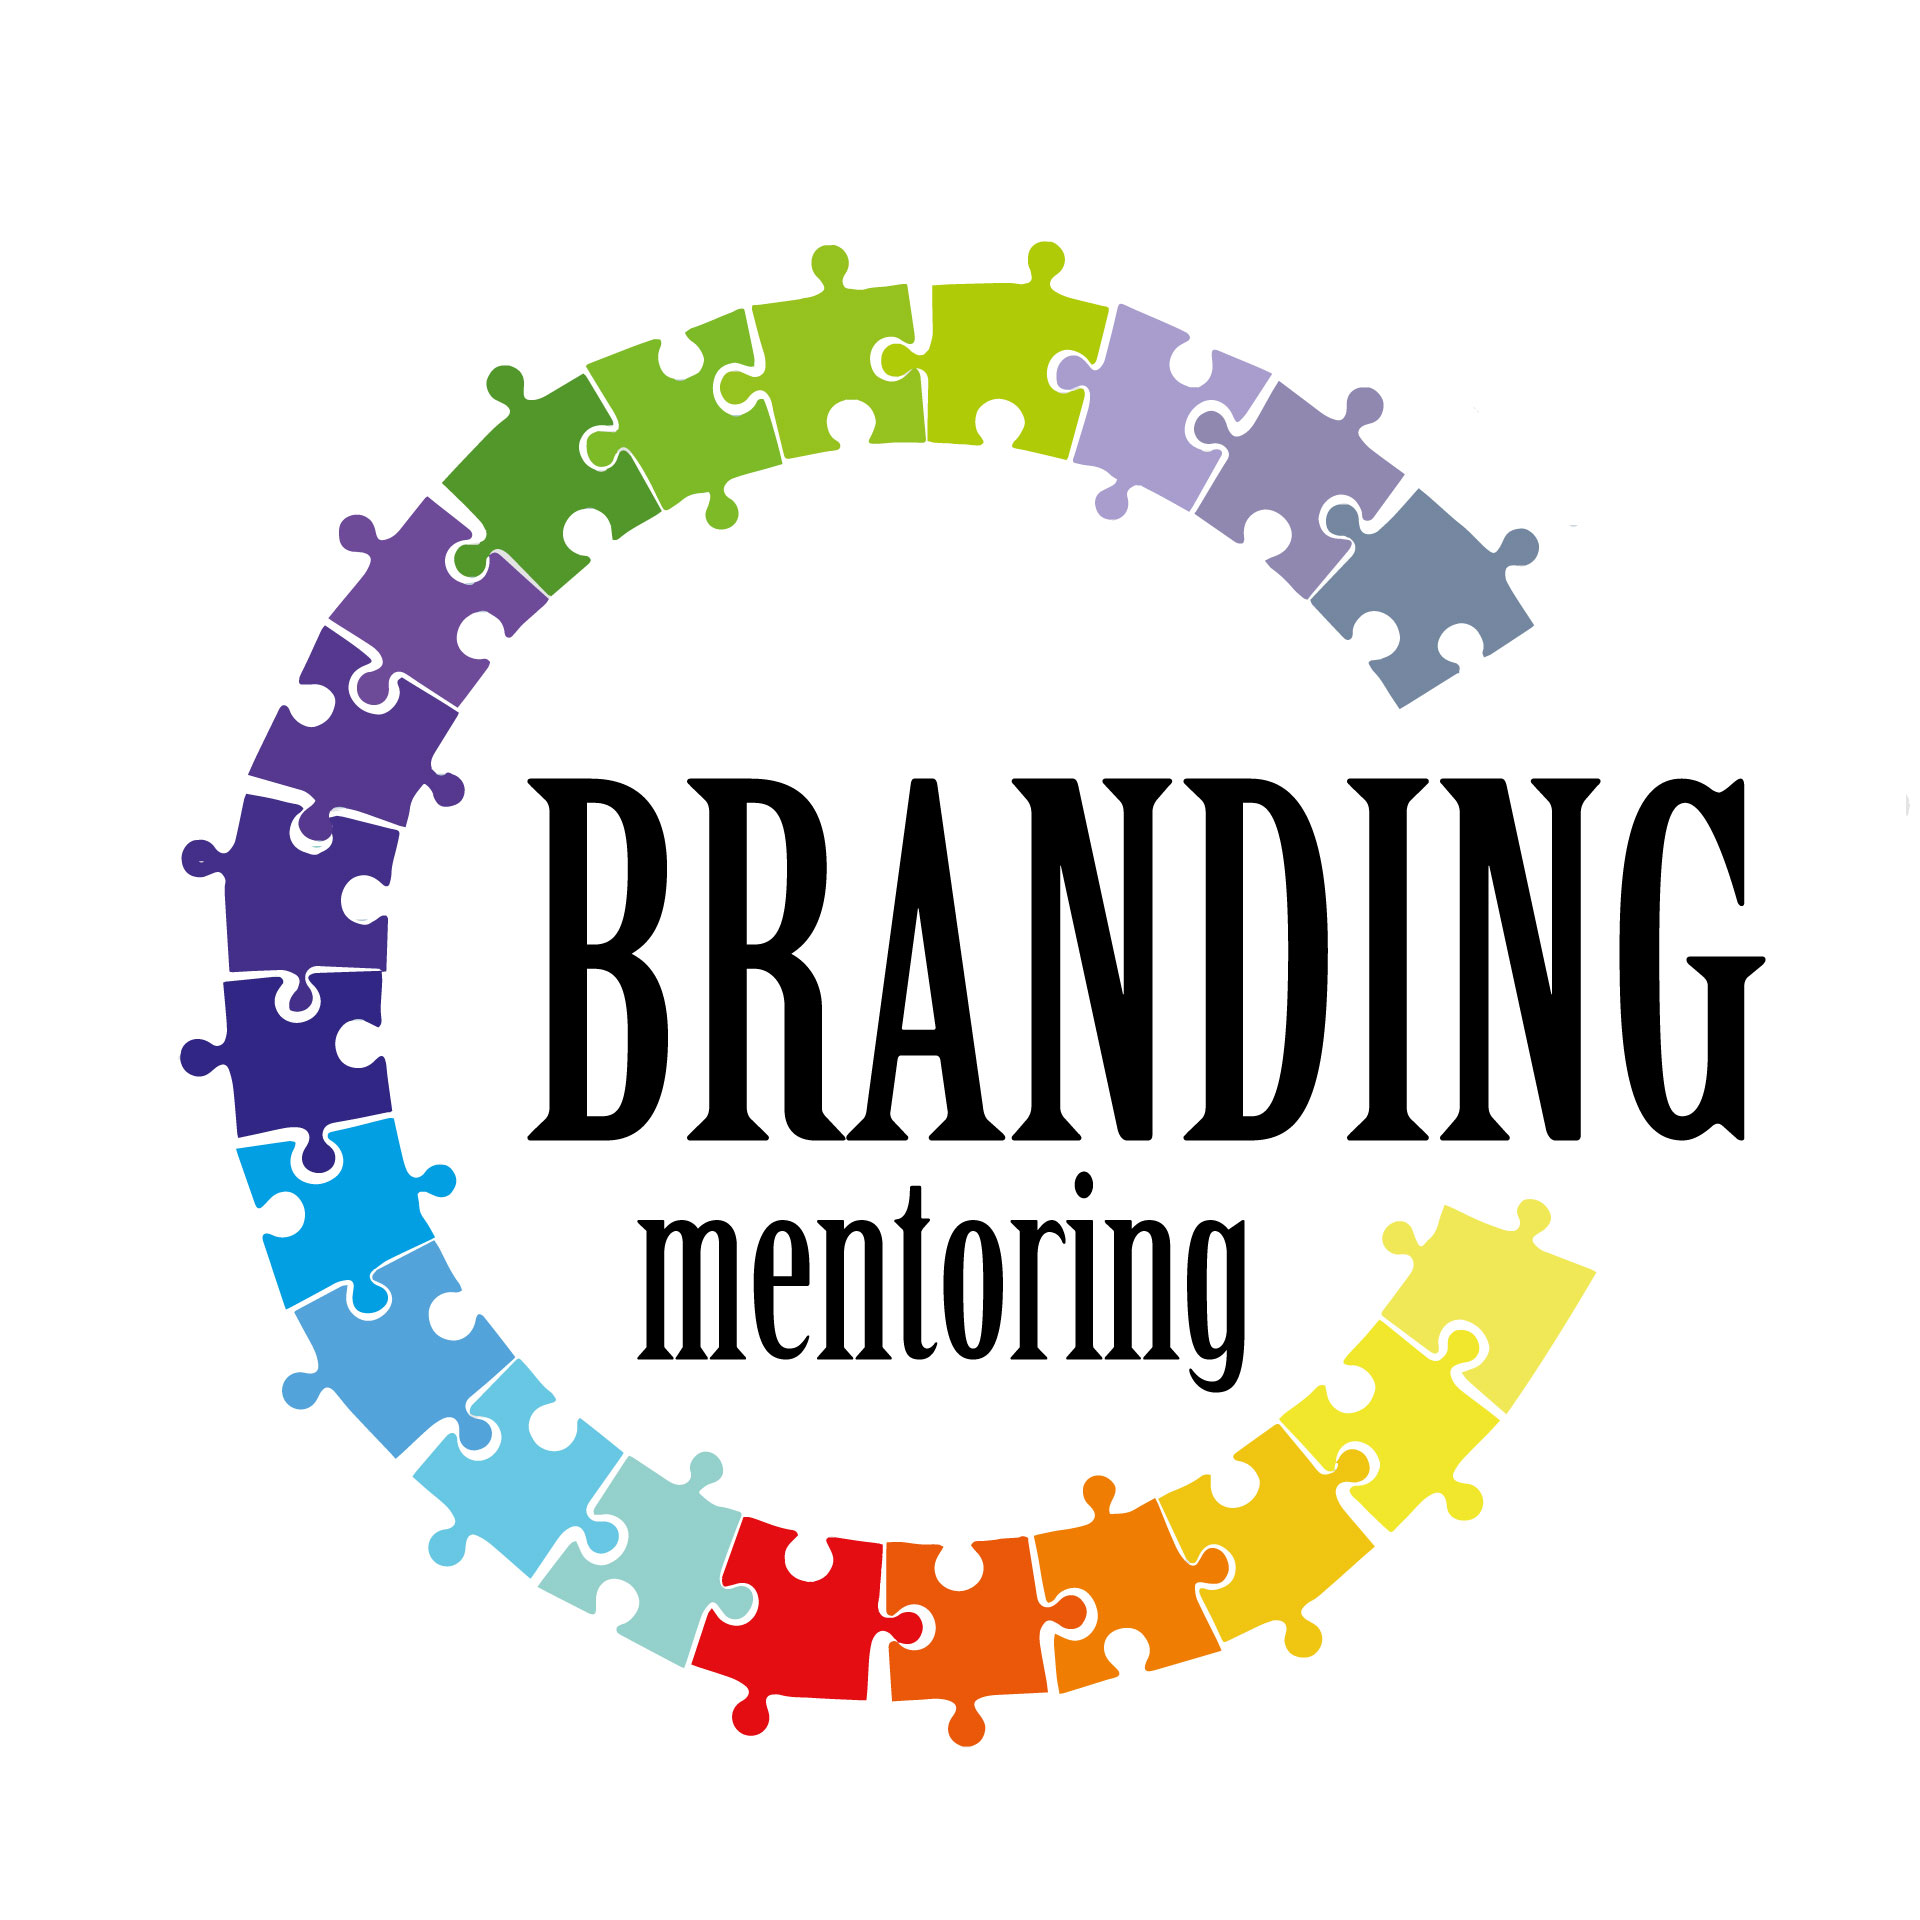 Projekt Banding Mentoring v ključni fazi